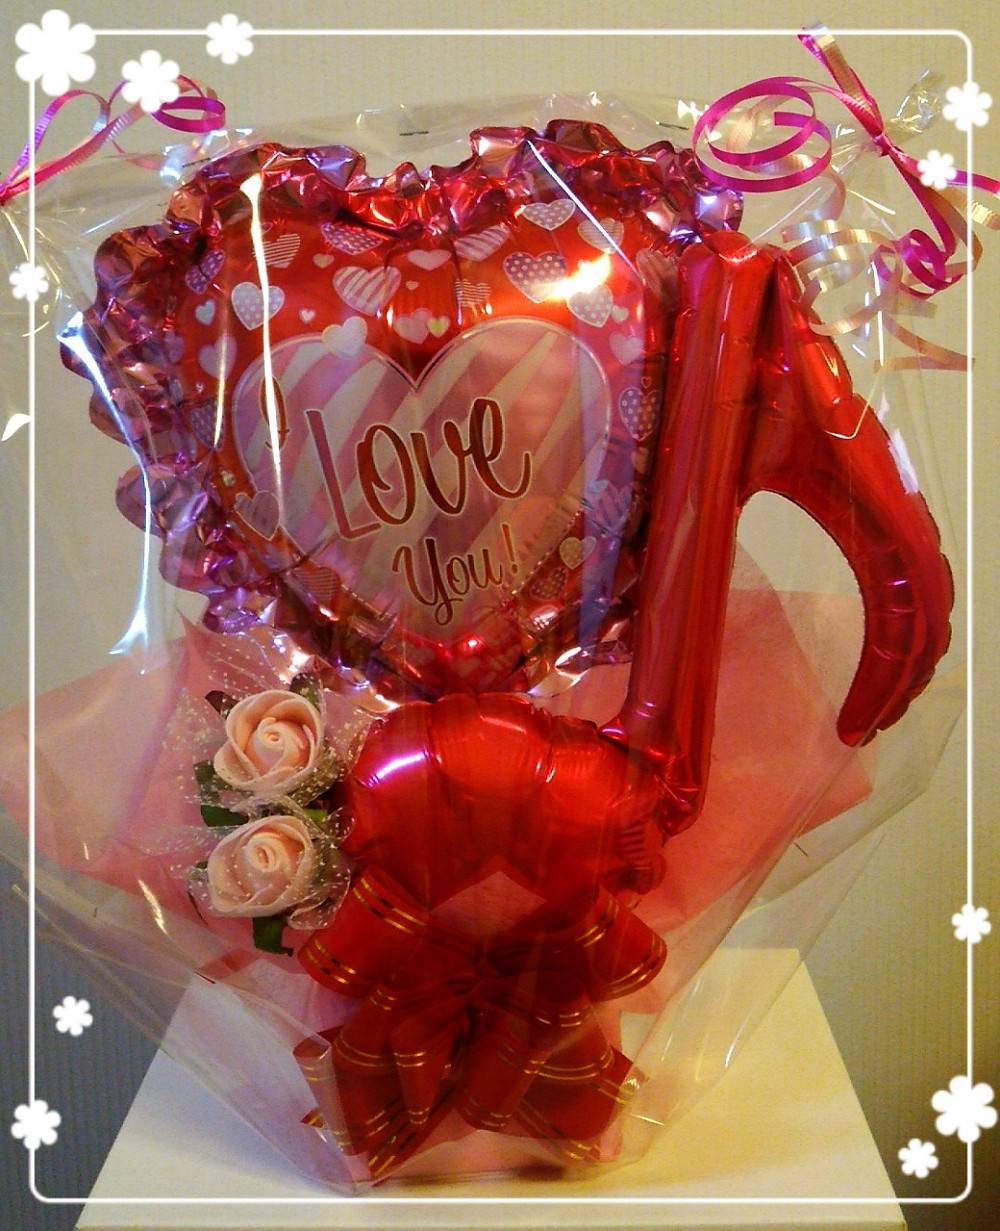 LINEcamera_share_2015-06-09-11-05-45.jpg